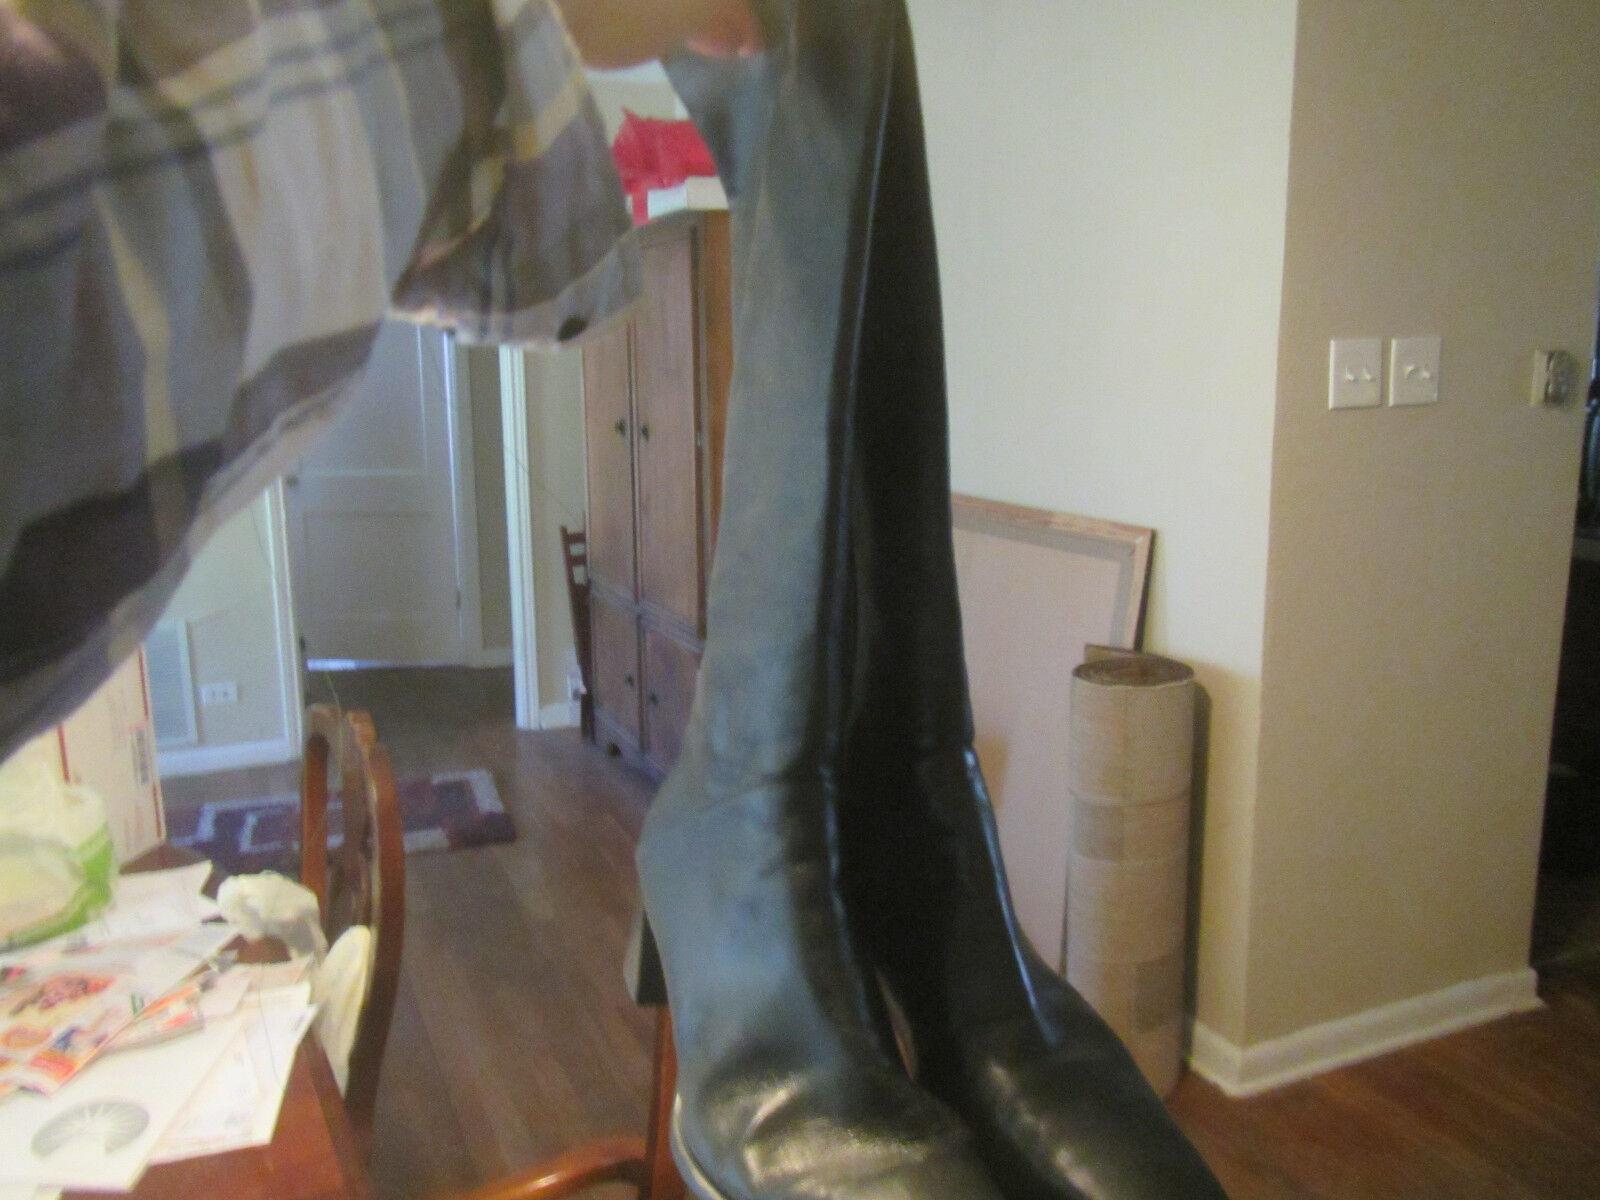 Stuart Weitzman Negro Knee High botas Puntera Talla 10 de altura media Puntera botas Cuadrada Cremallera b335c6